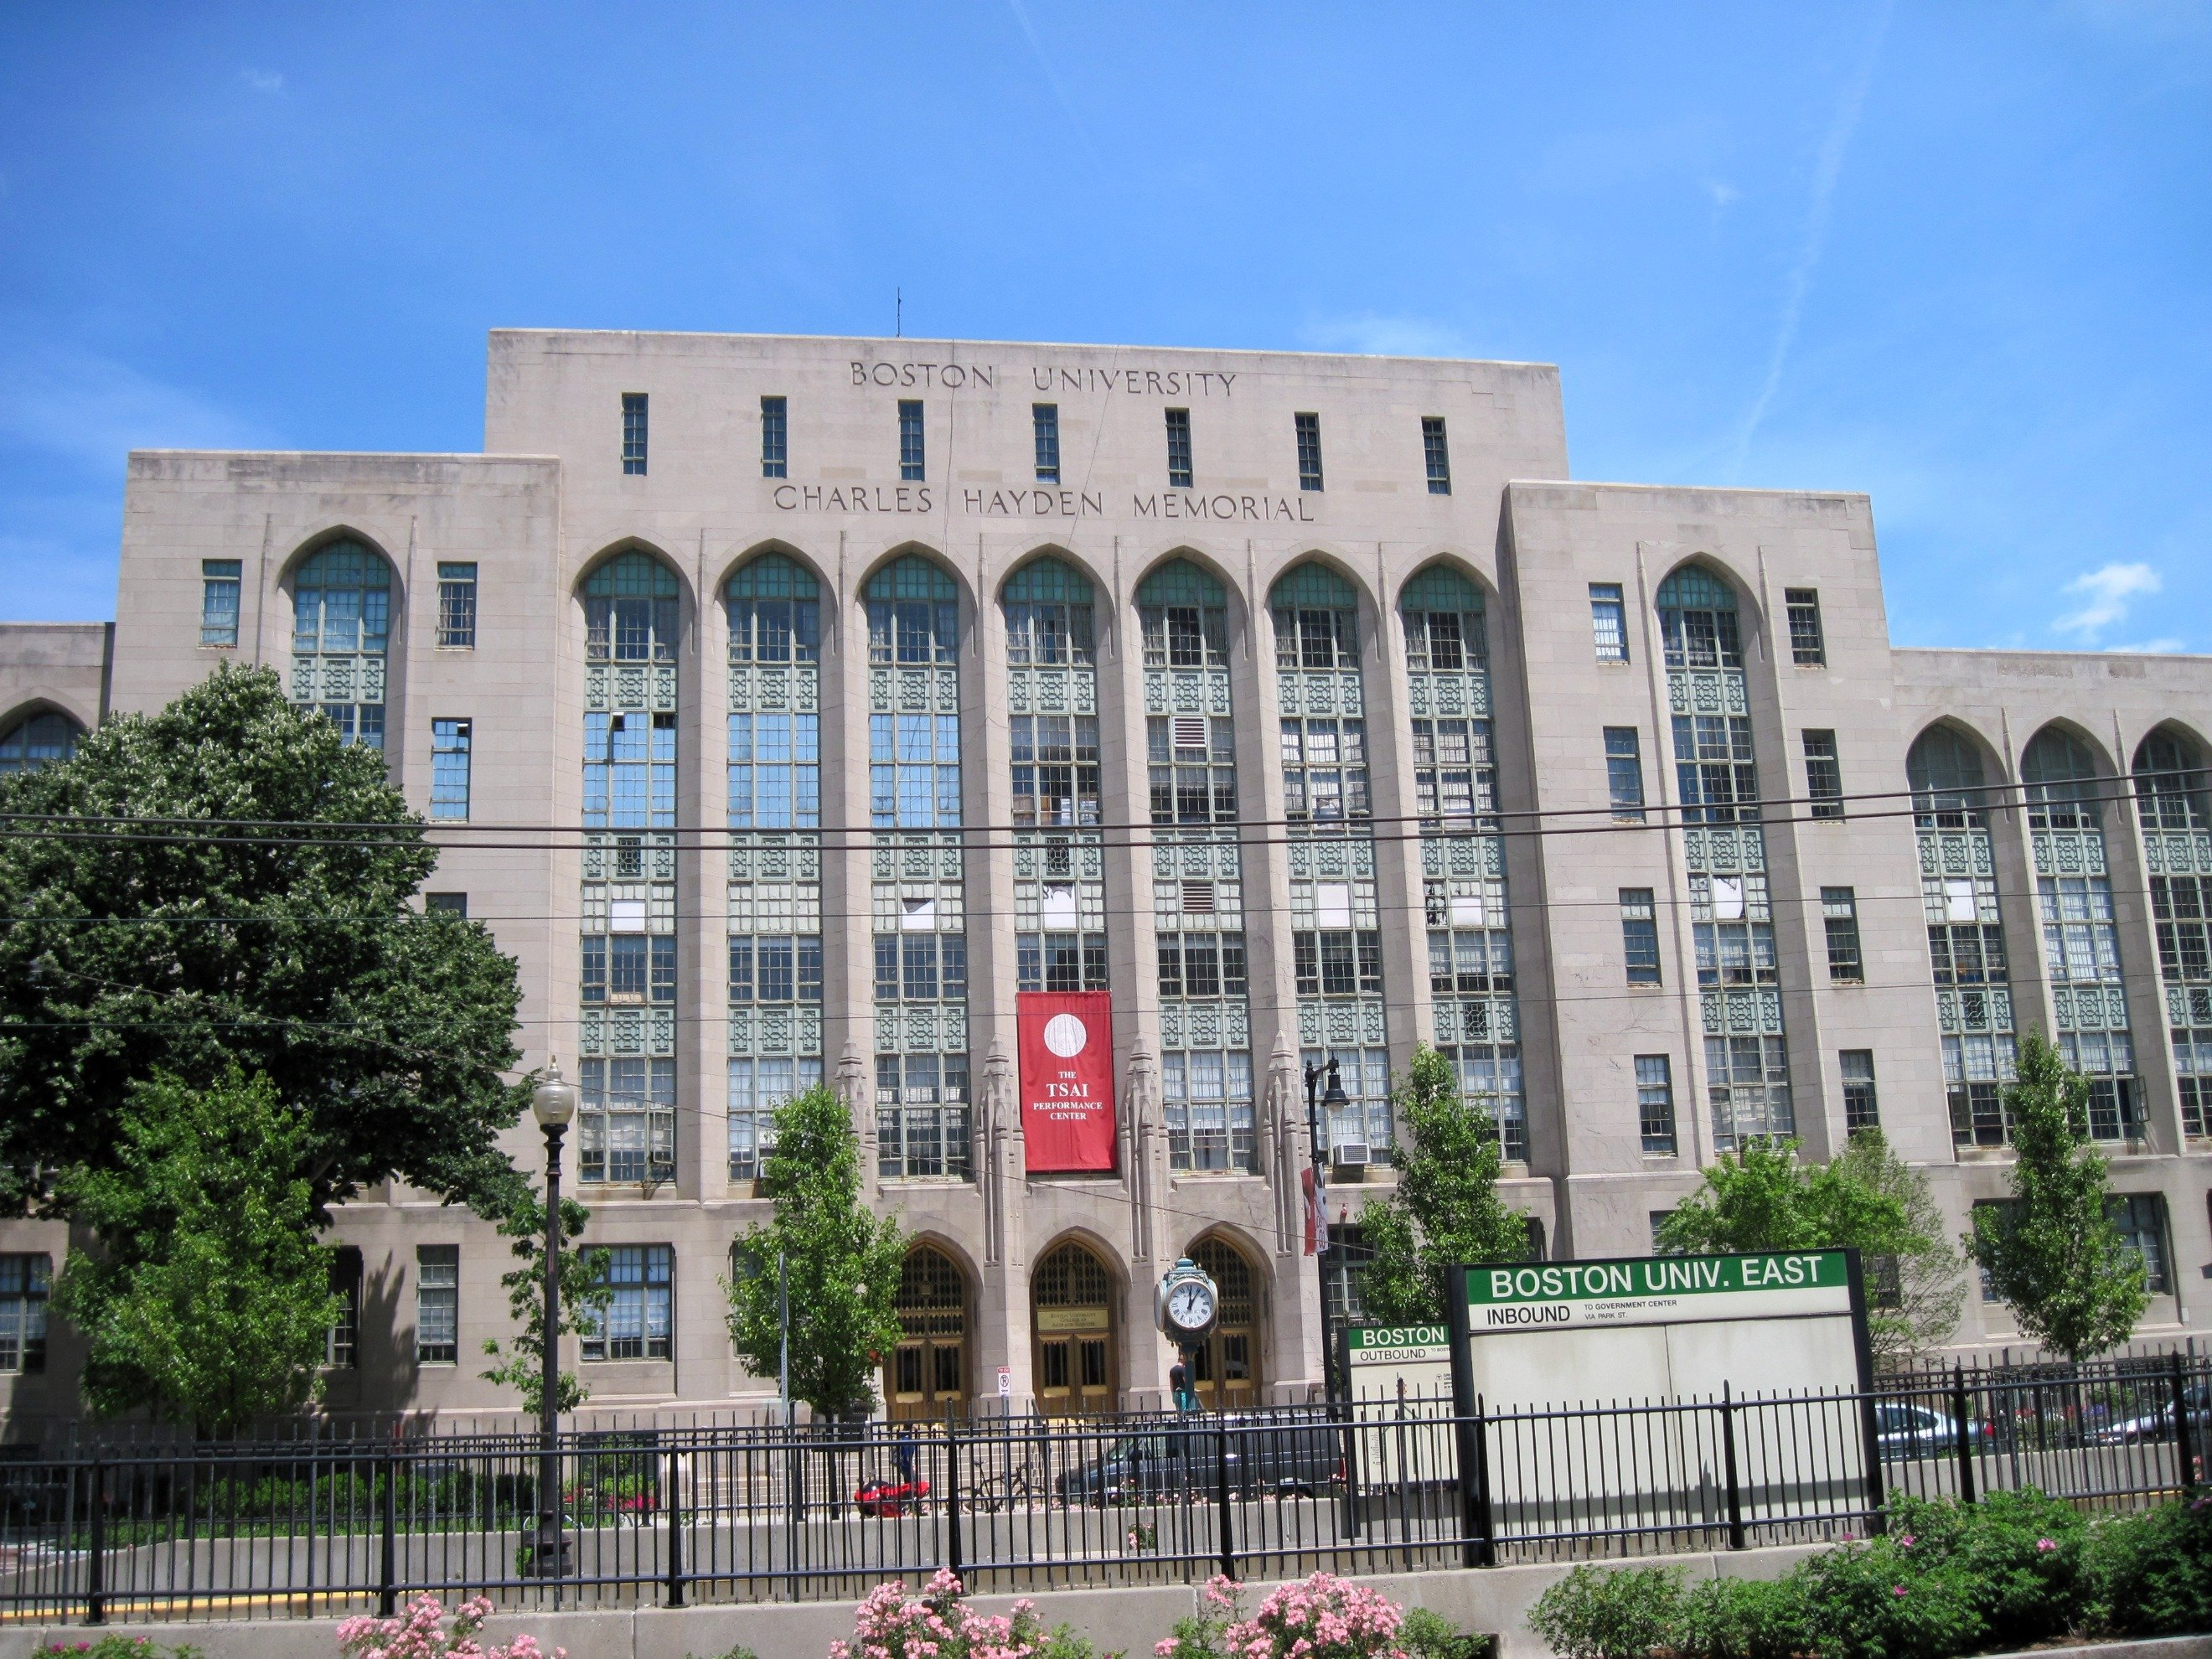 Boston University Graduate School of Arts and Sciences- present day